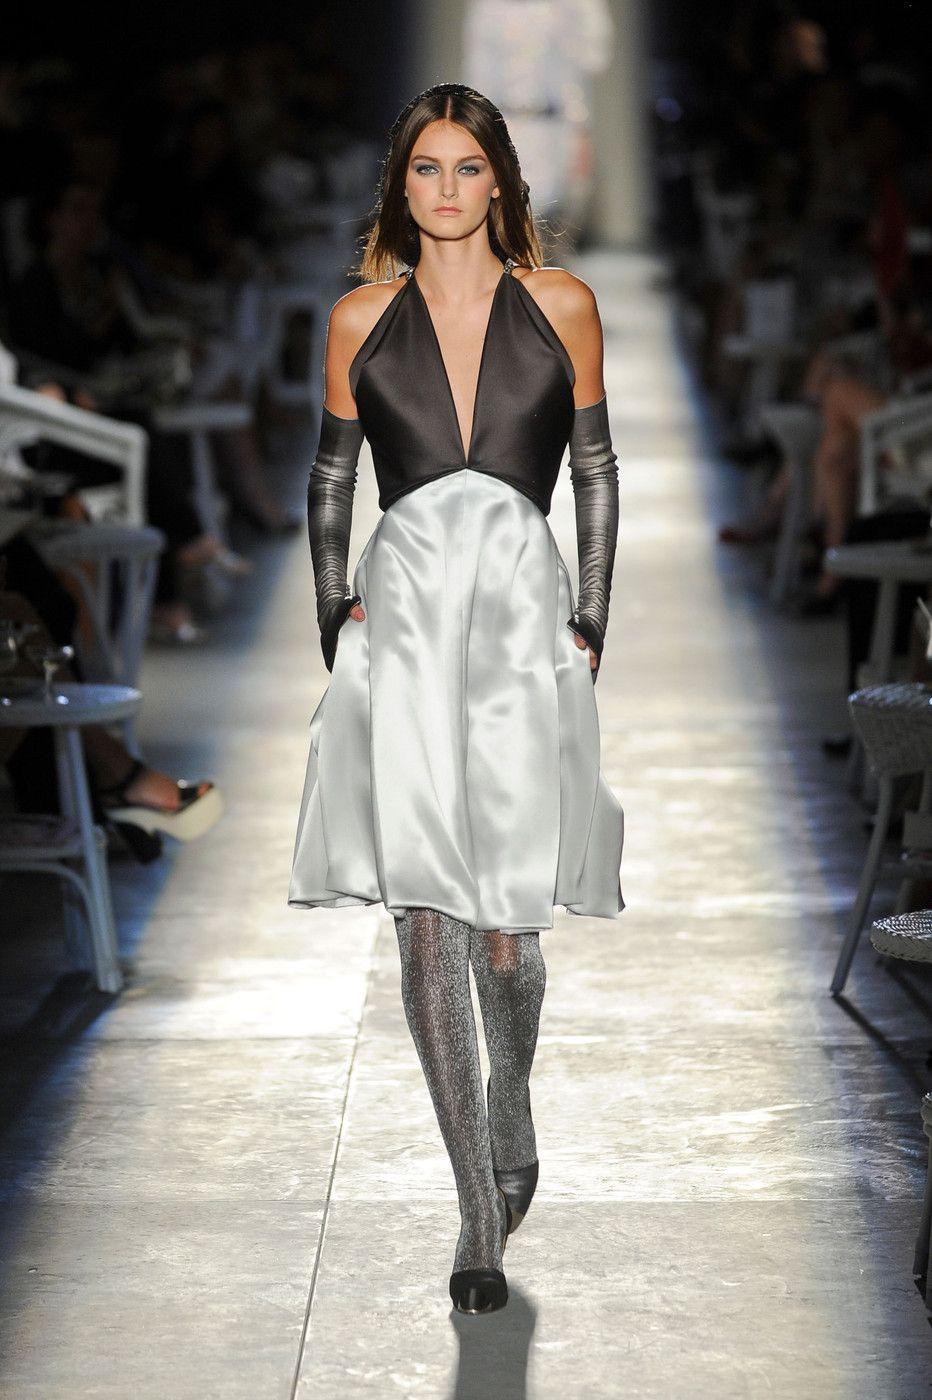 Fashion Show  Неделя Высокой Моды в Париже  Chanel Haute Couture F W 2012  2013 (2 часть) 32a6a7bc1c0